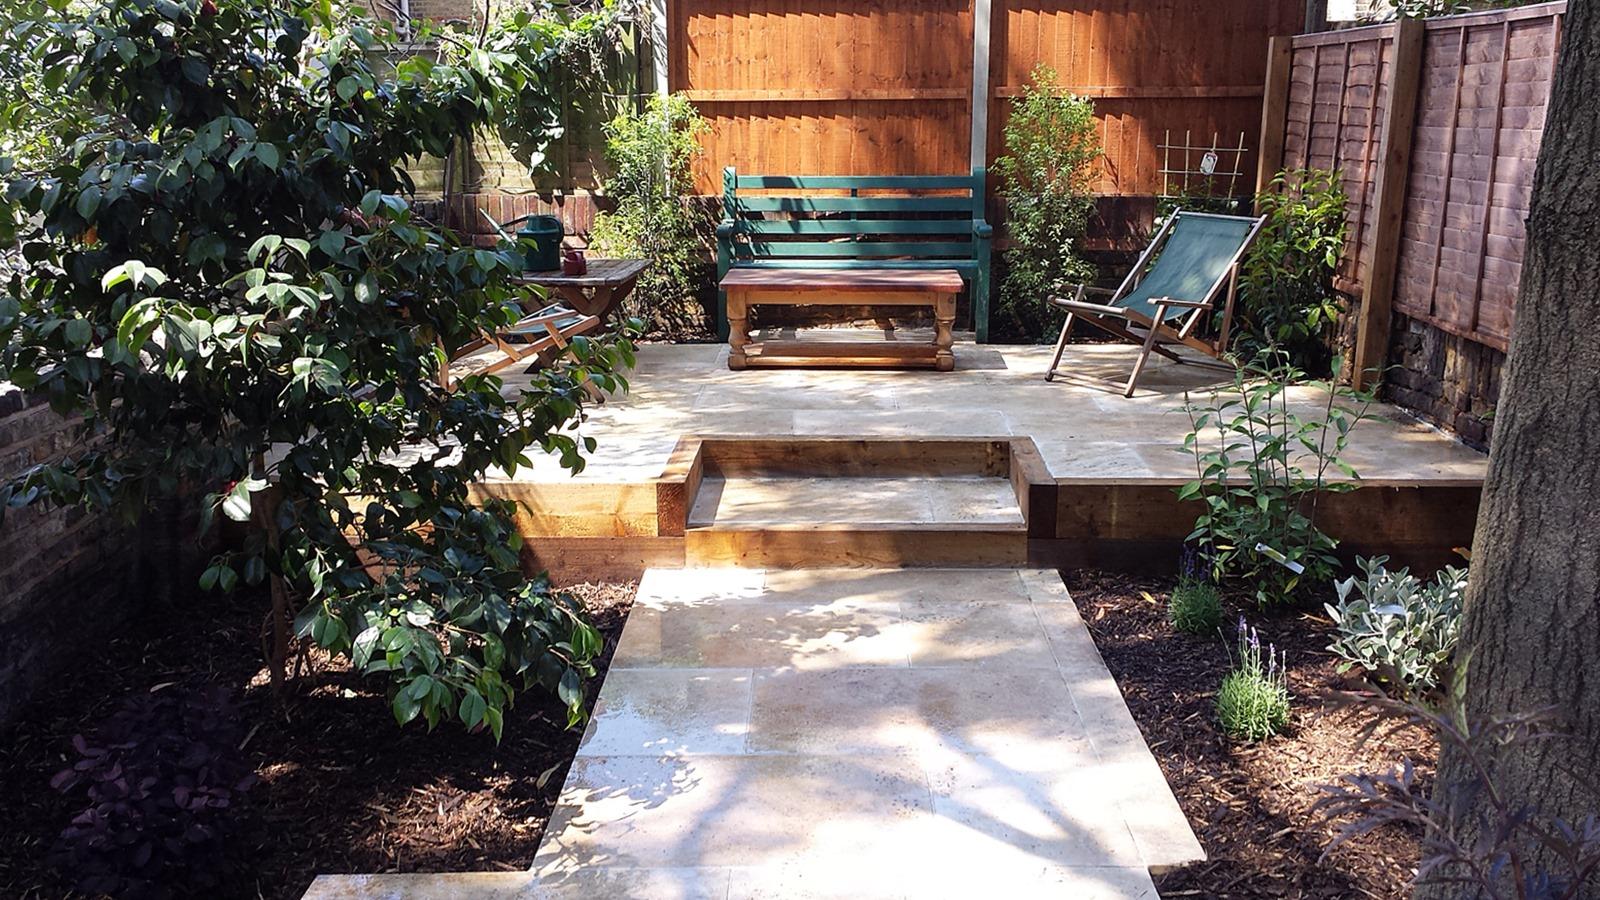 Travertine Paving Patio Modern Garden Design Landscaping ... on Modern Garden Patio Ideas id=11907